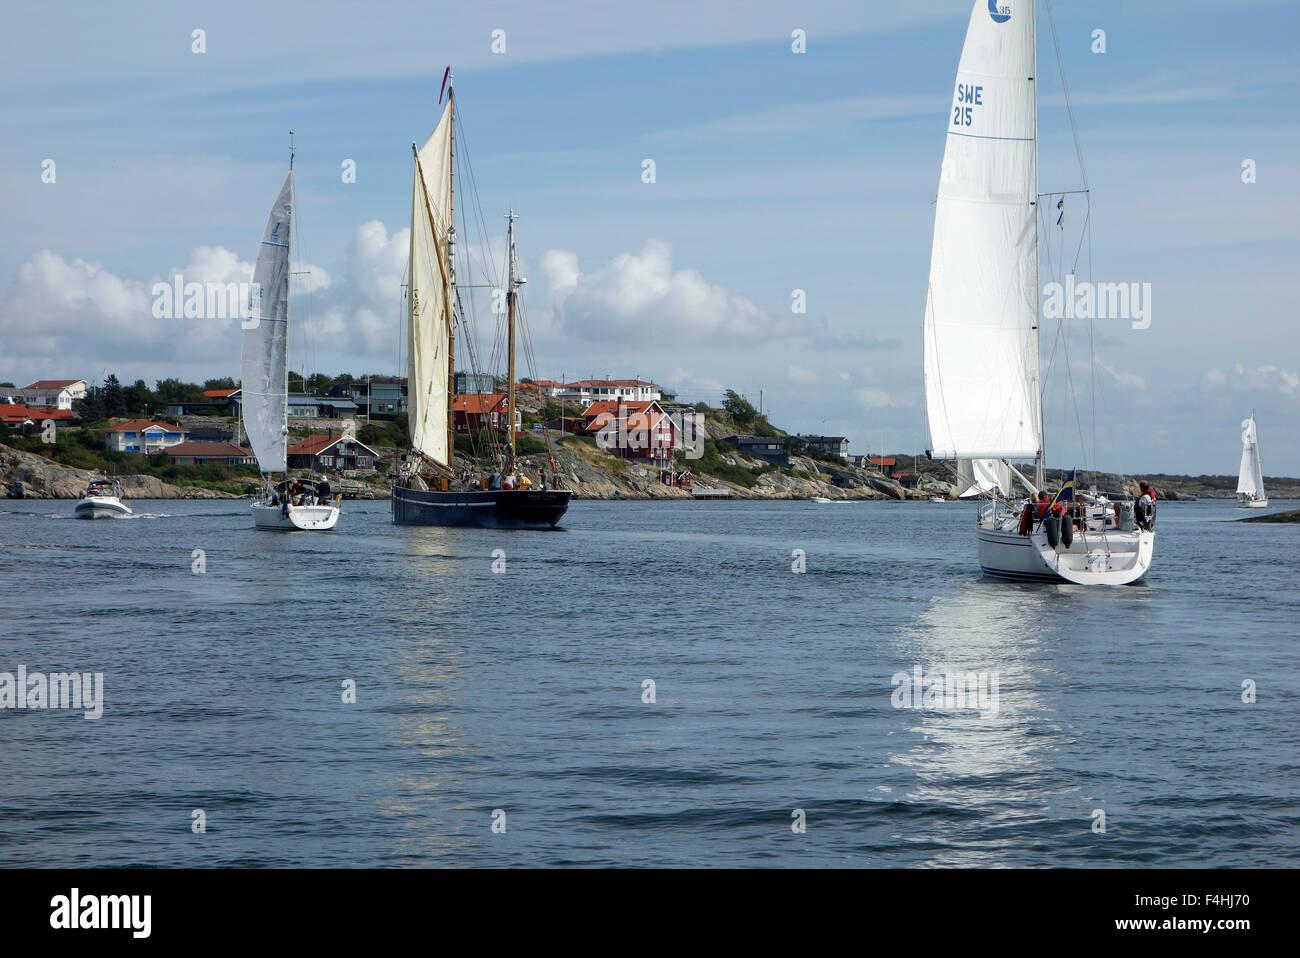 Cruising sailboats  in sound between  Stora Varholmen island and Hjuvik koast on Swedish West coast. Gothenburg, Stock Photo